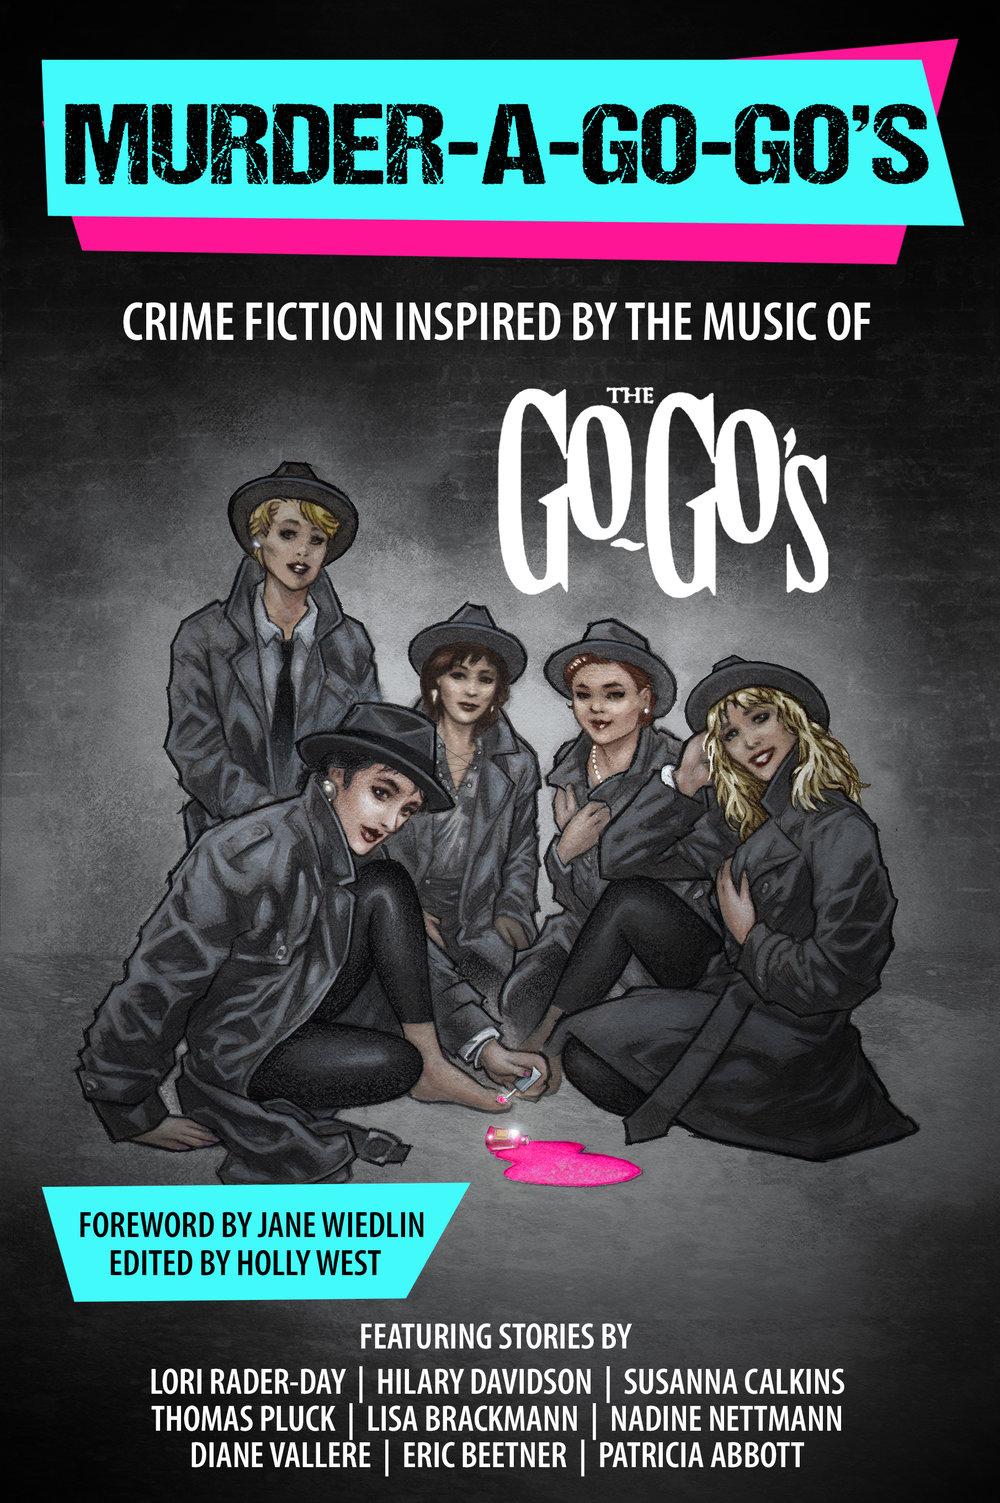 cover-west-murder-go-gos-front.jpg